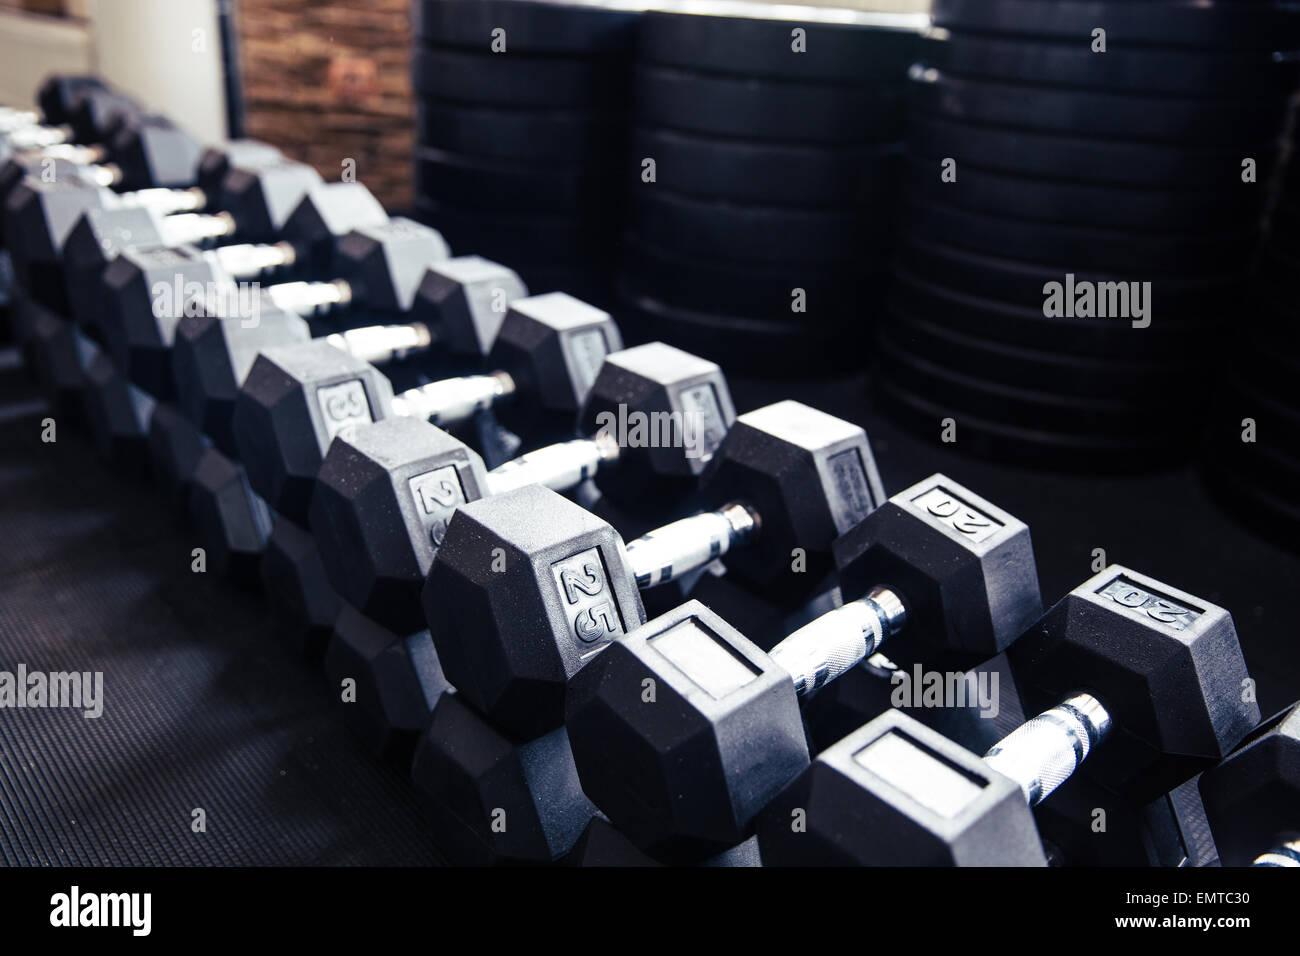 Nahaufnahme Bild von Hanteln im Fitnessstudio Stockbild